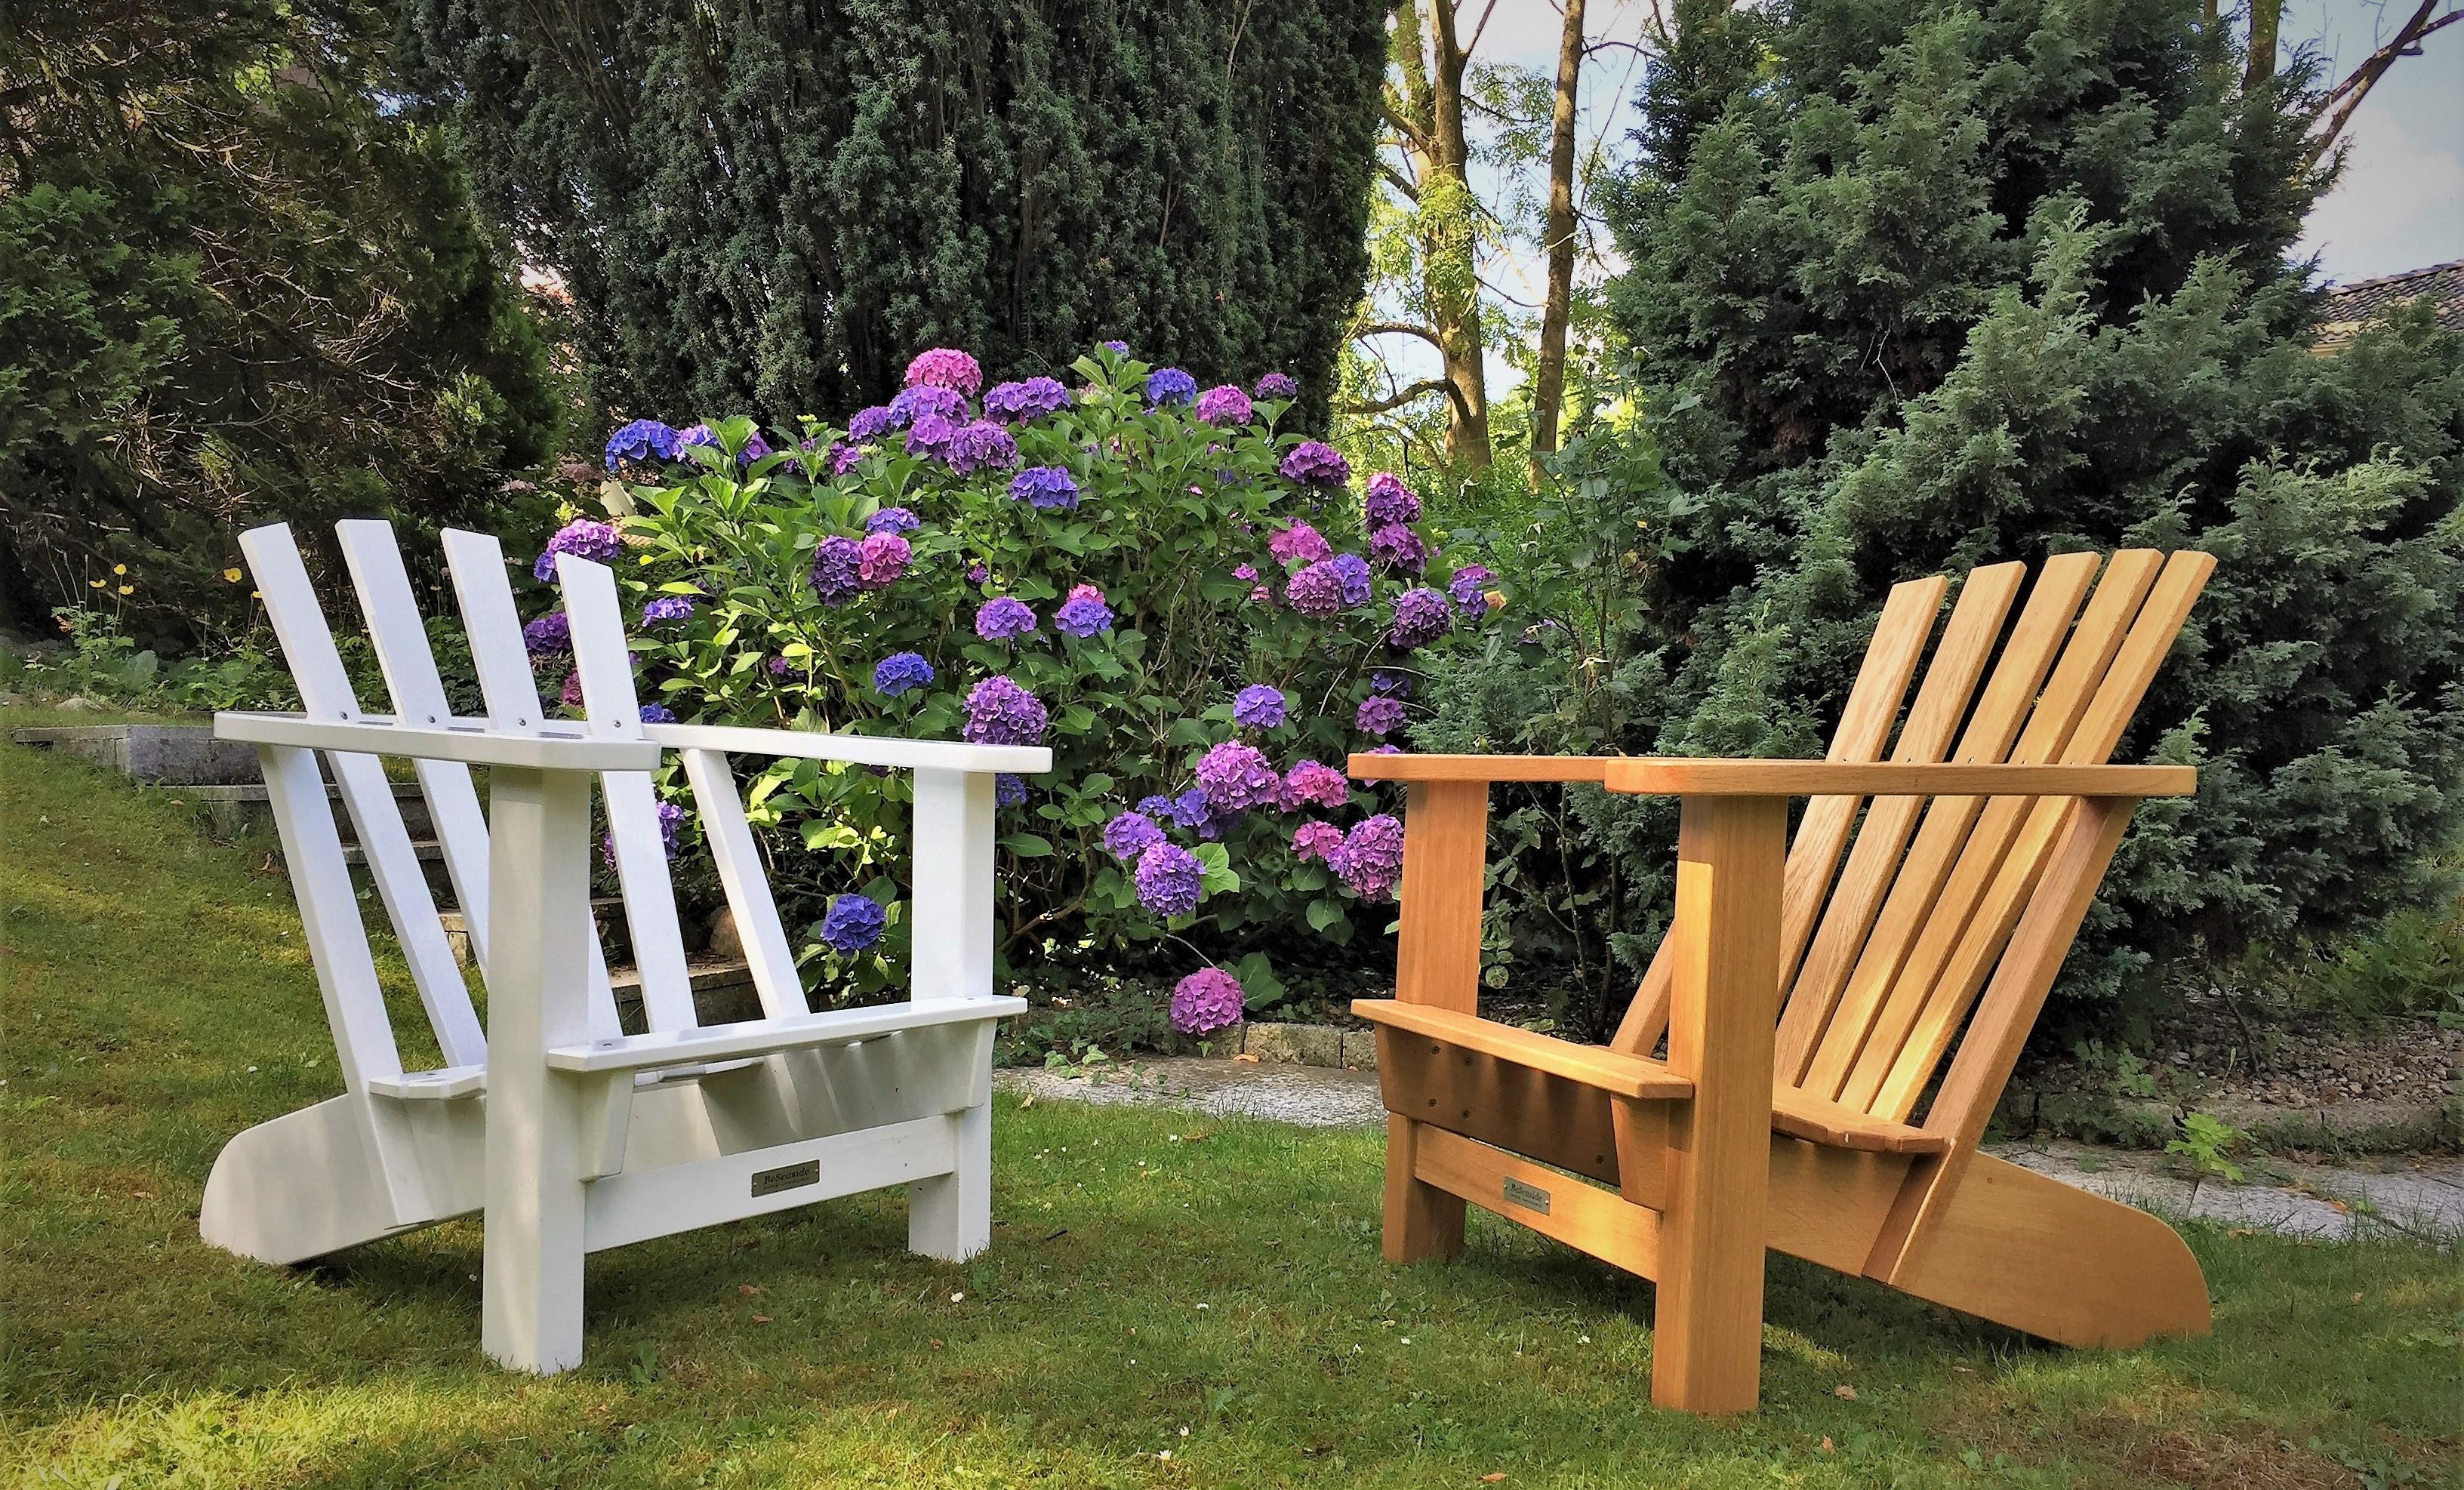 BeSeaside Adirondack Chair Hummelstuhl